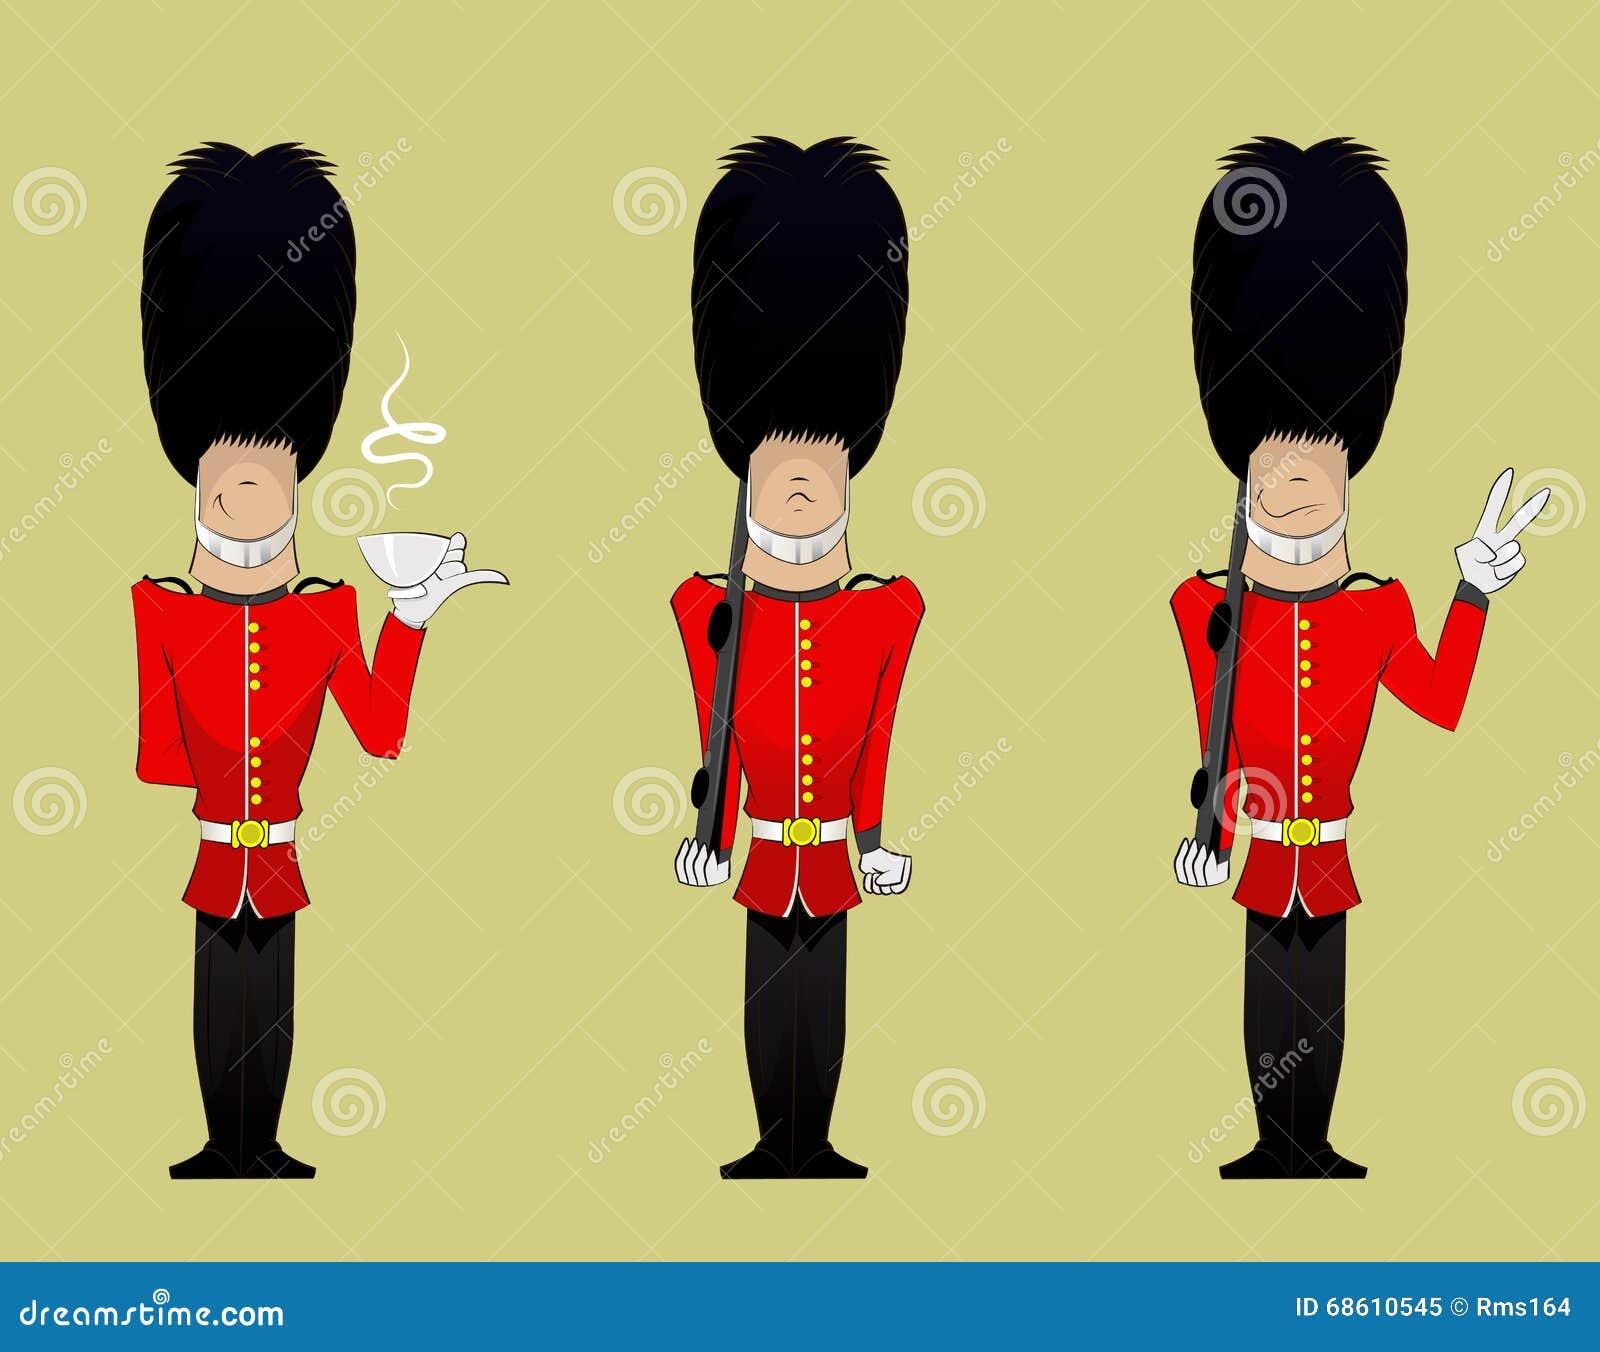 Queen Soldier illustration stock vector. Illustration of ...